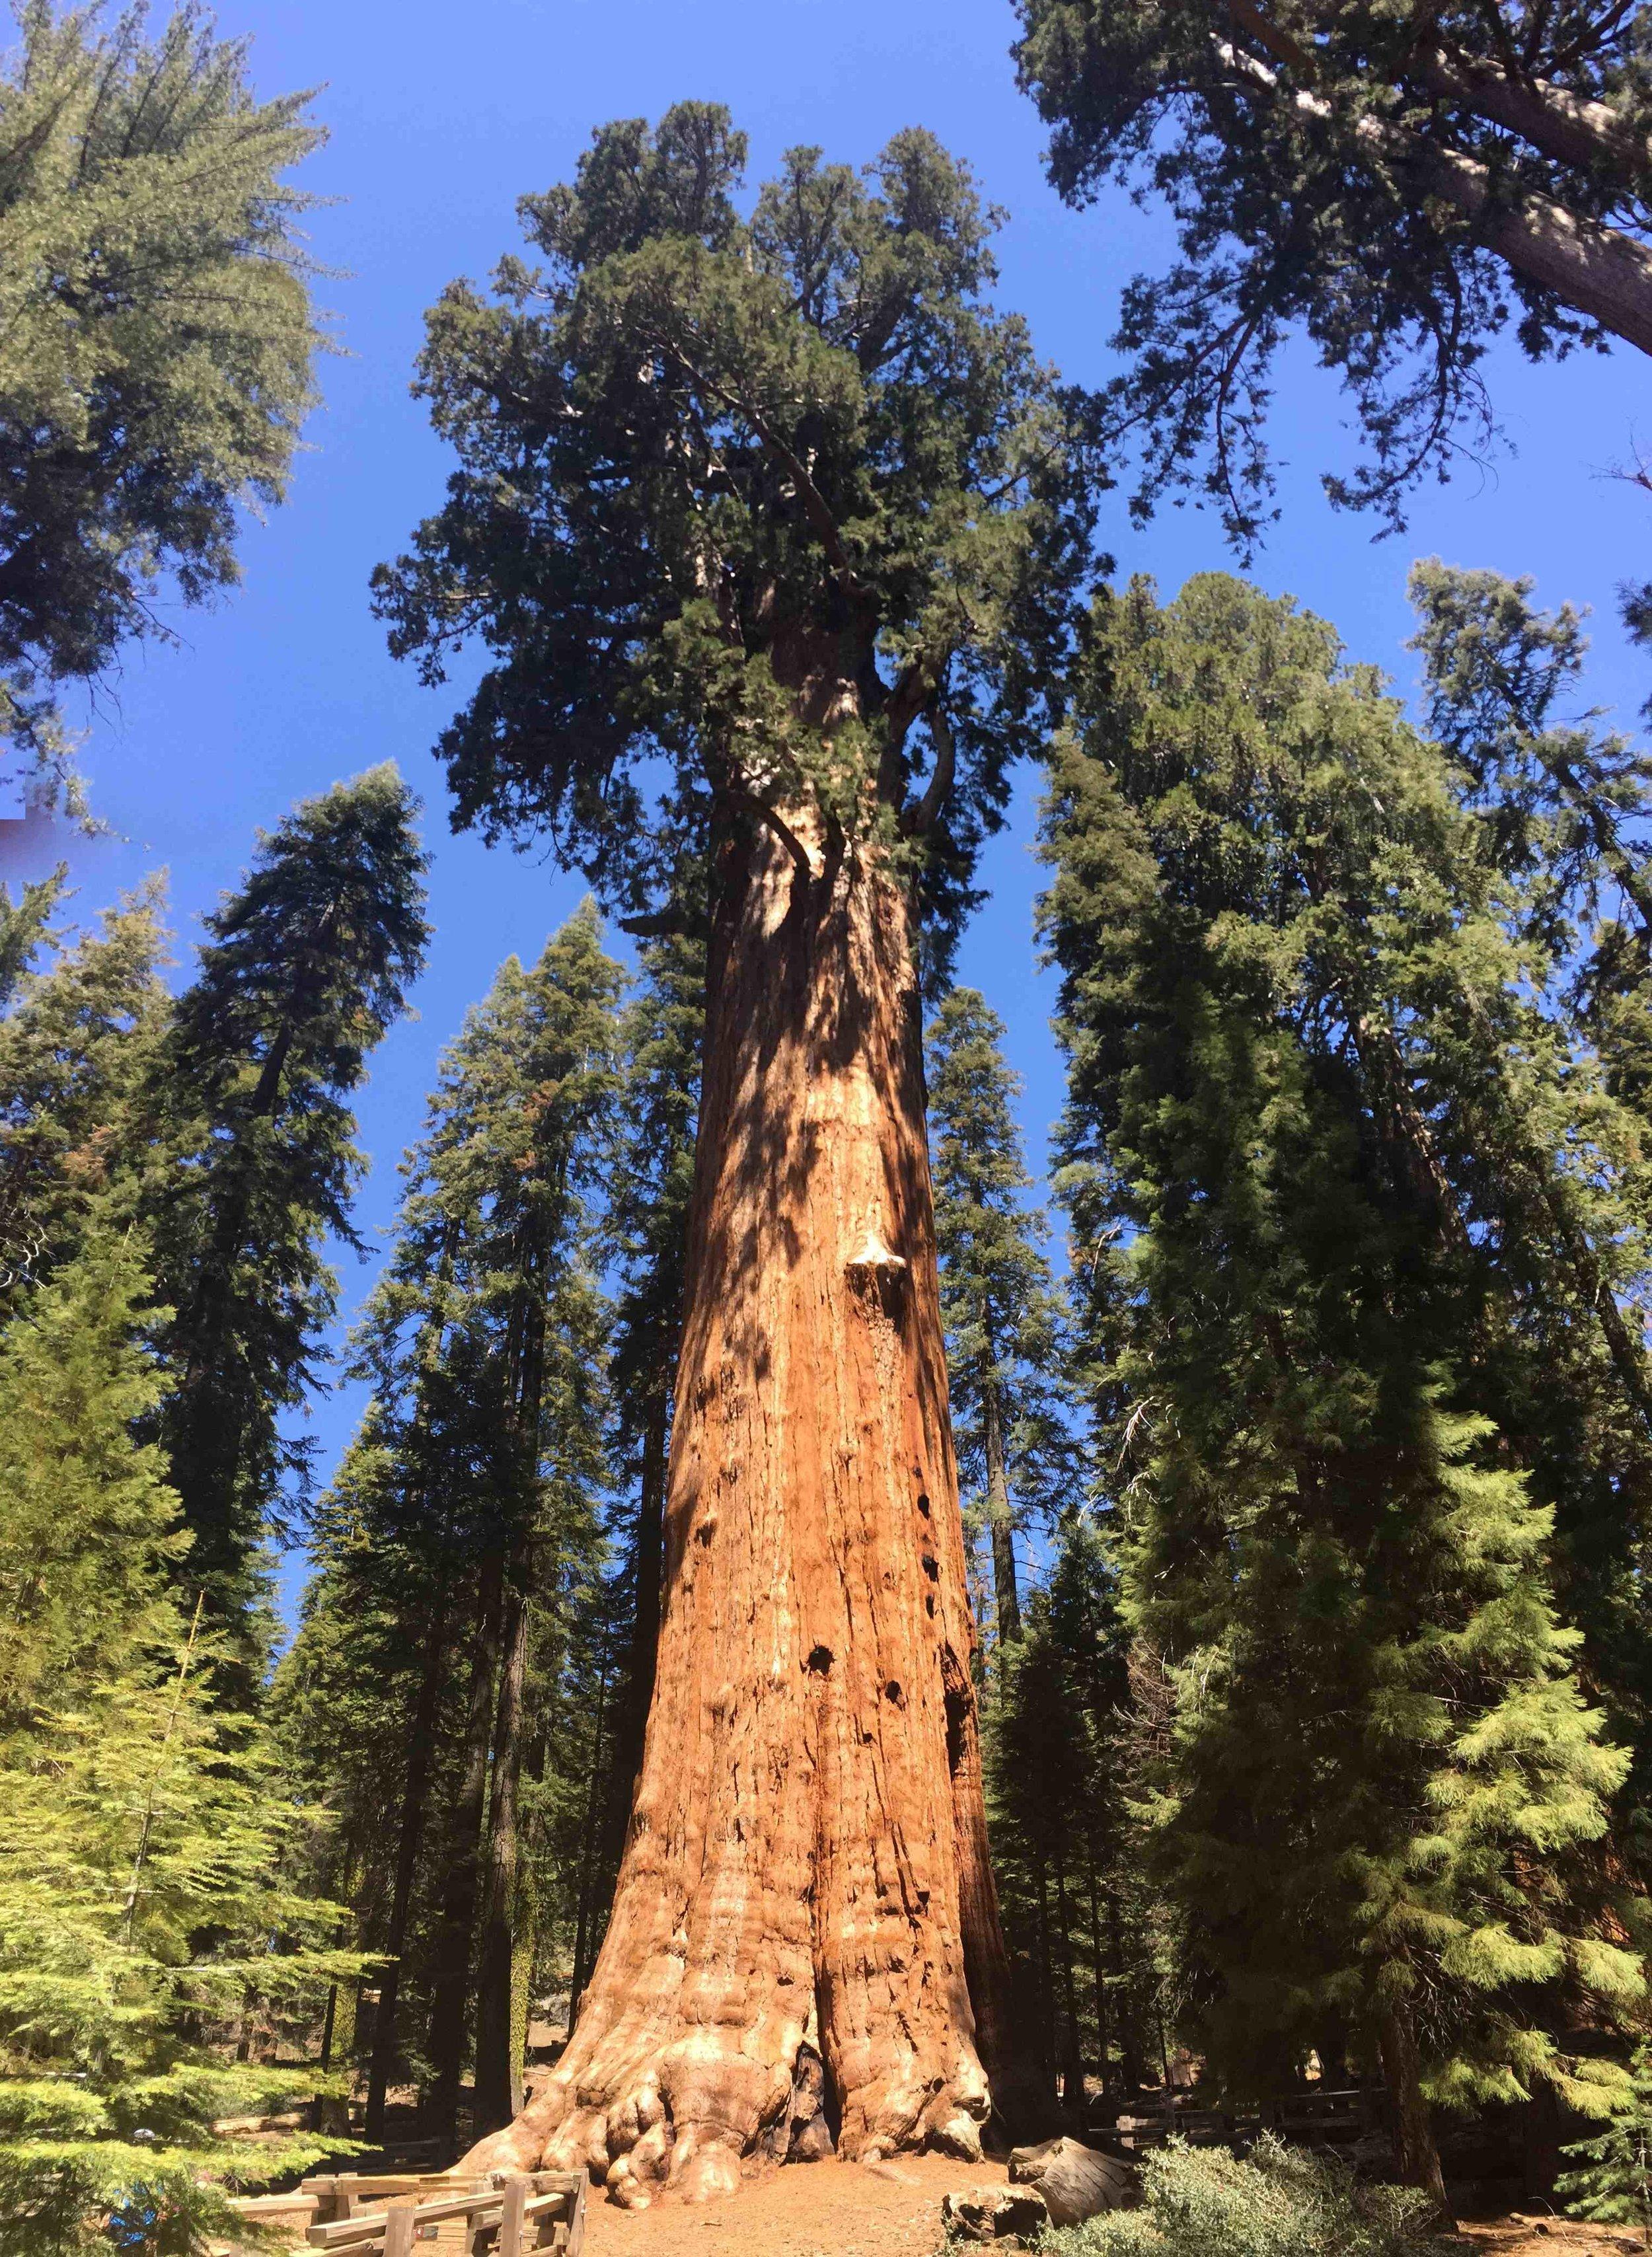 General Sherman Largest Tree Earth - Dr Reese Halter.jpg